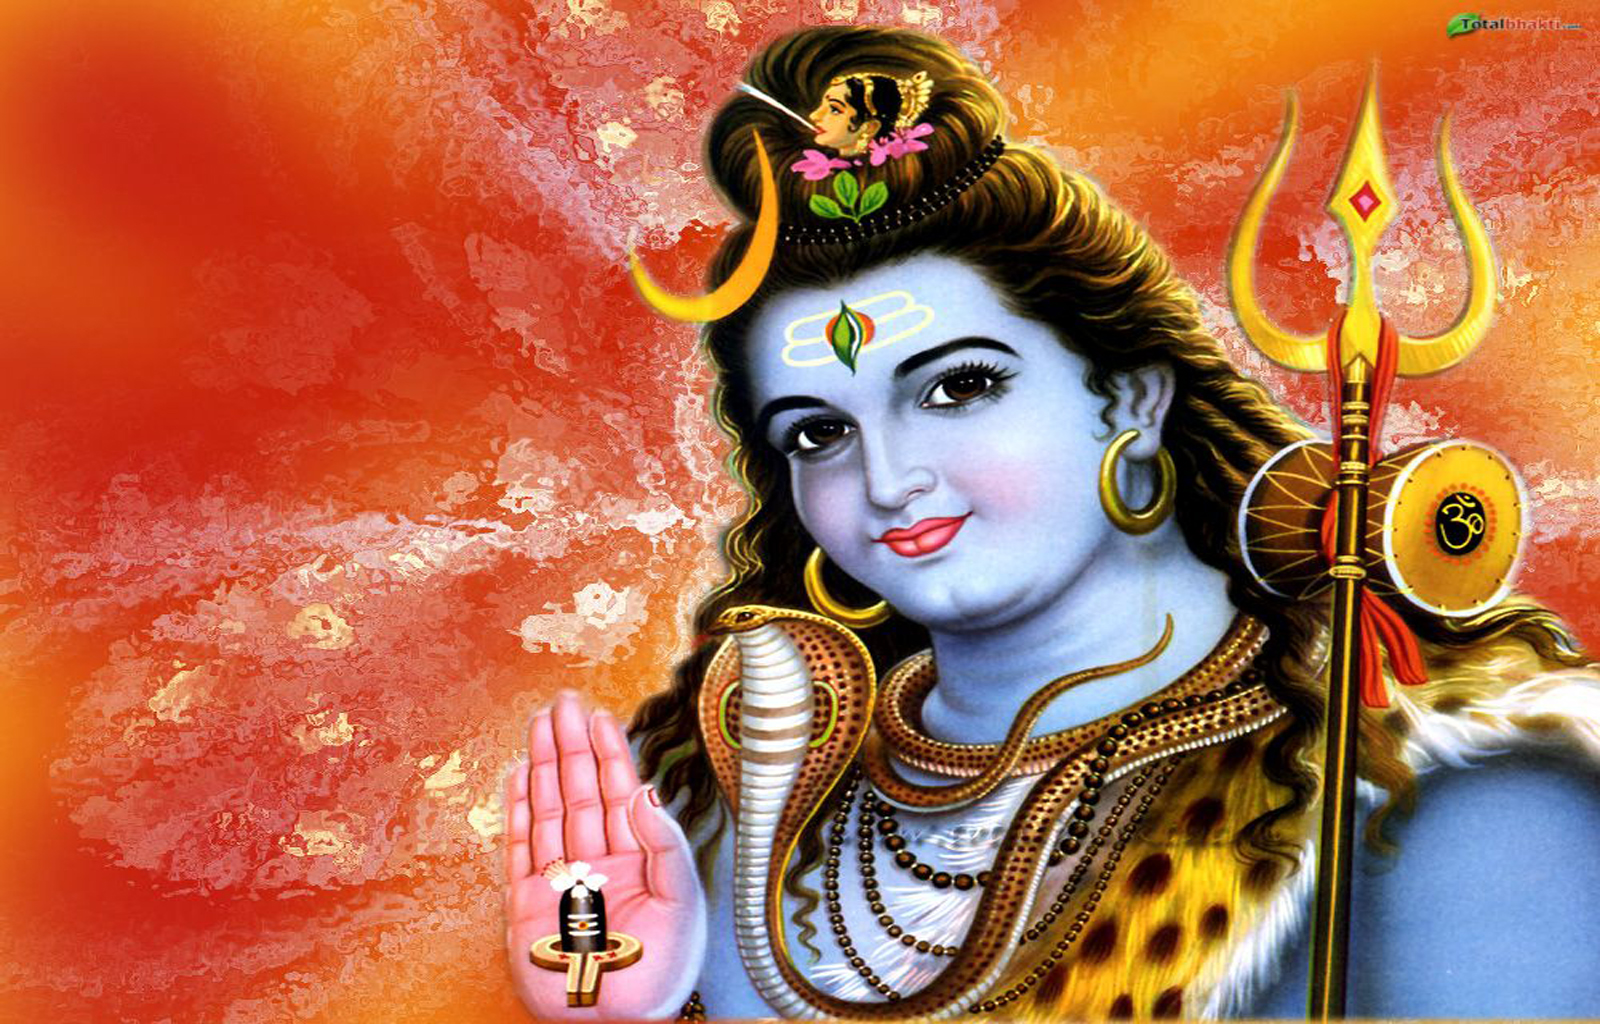 Lord shiva wallpapers hd wallpapersafari - Wallpaper 1600x1024 ...